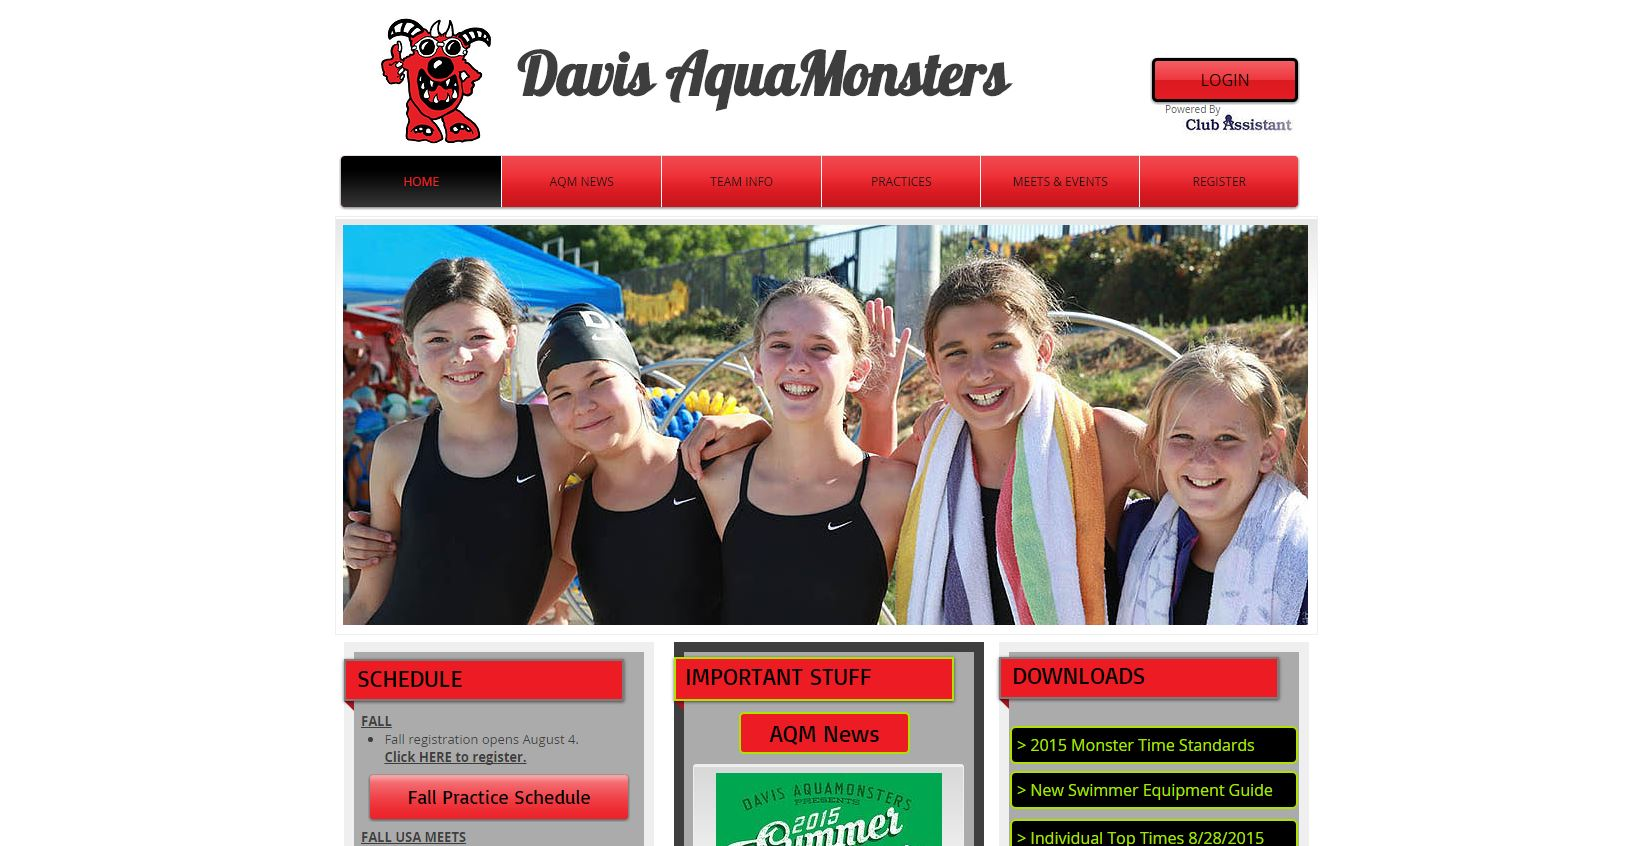 Screenshot of DavisAquamonsters.com